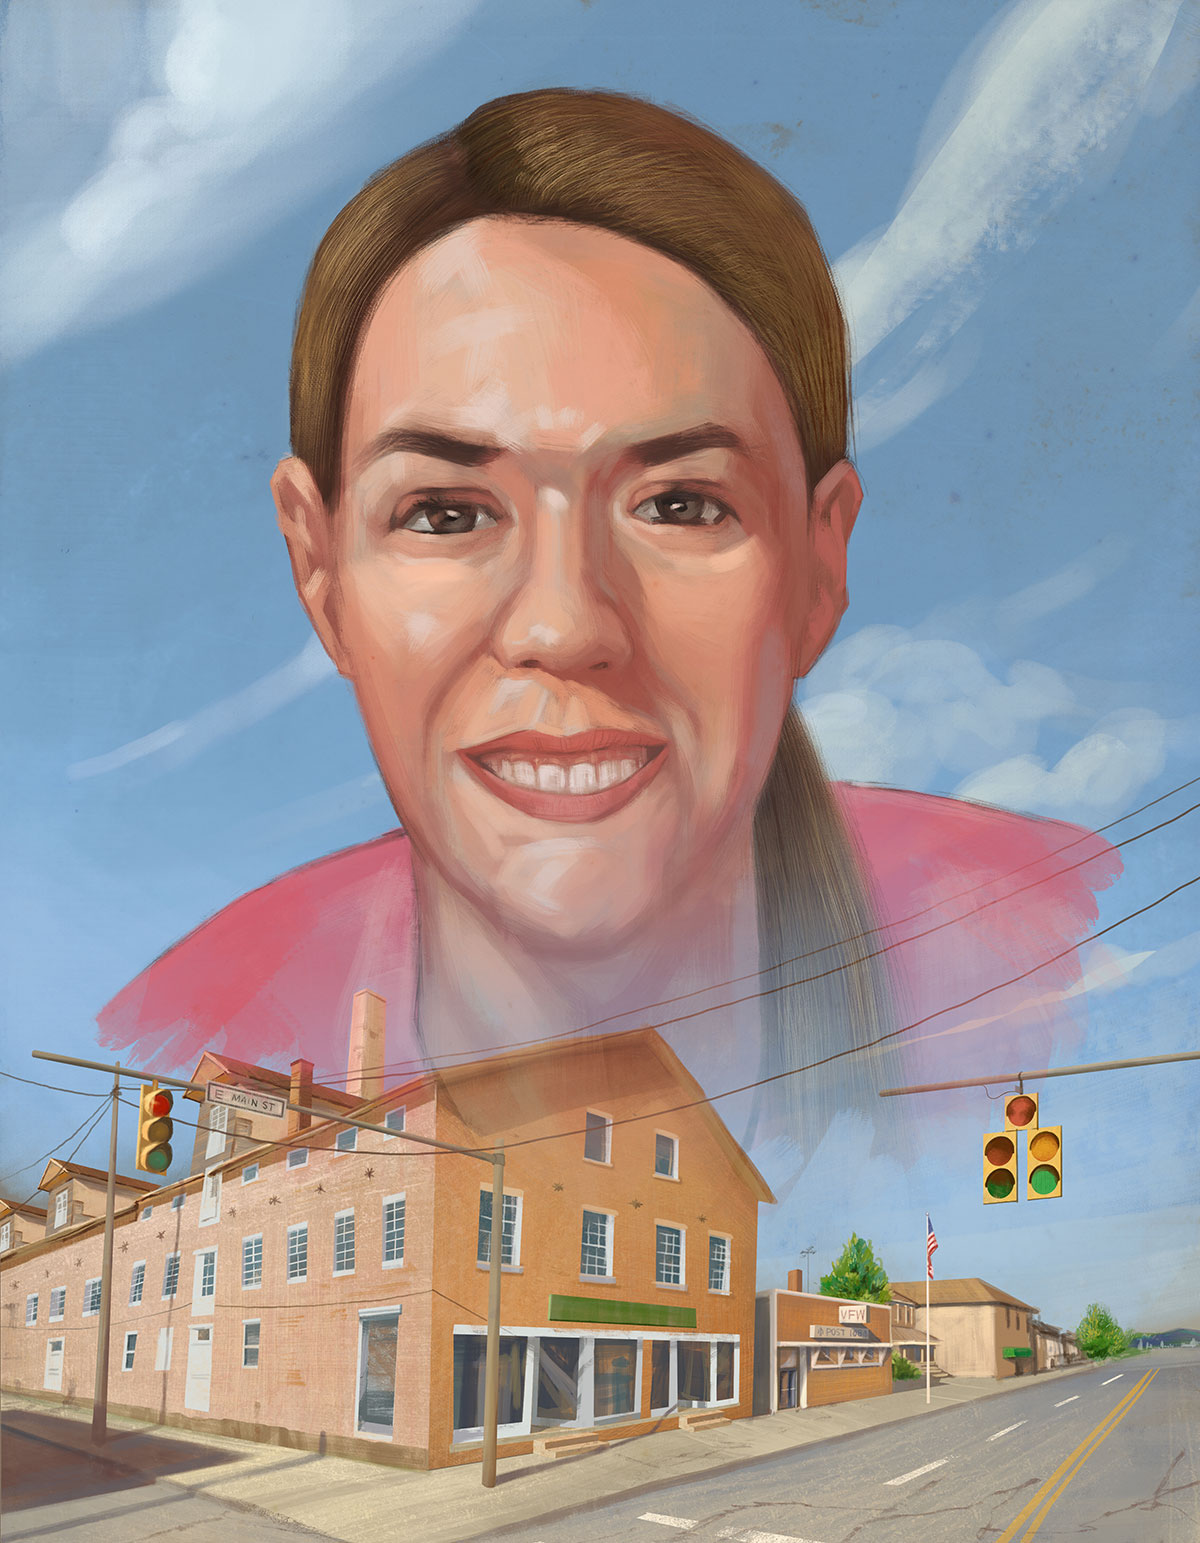 missing,Chillicothe,ohio,investigation,discovery,magazine,Landscape,cityscape,portraits,women